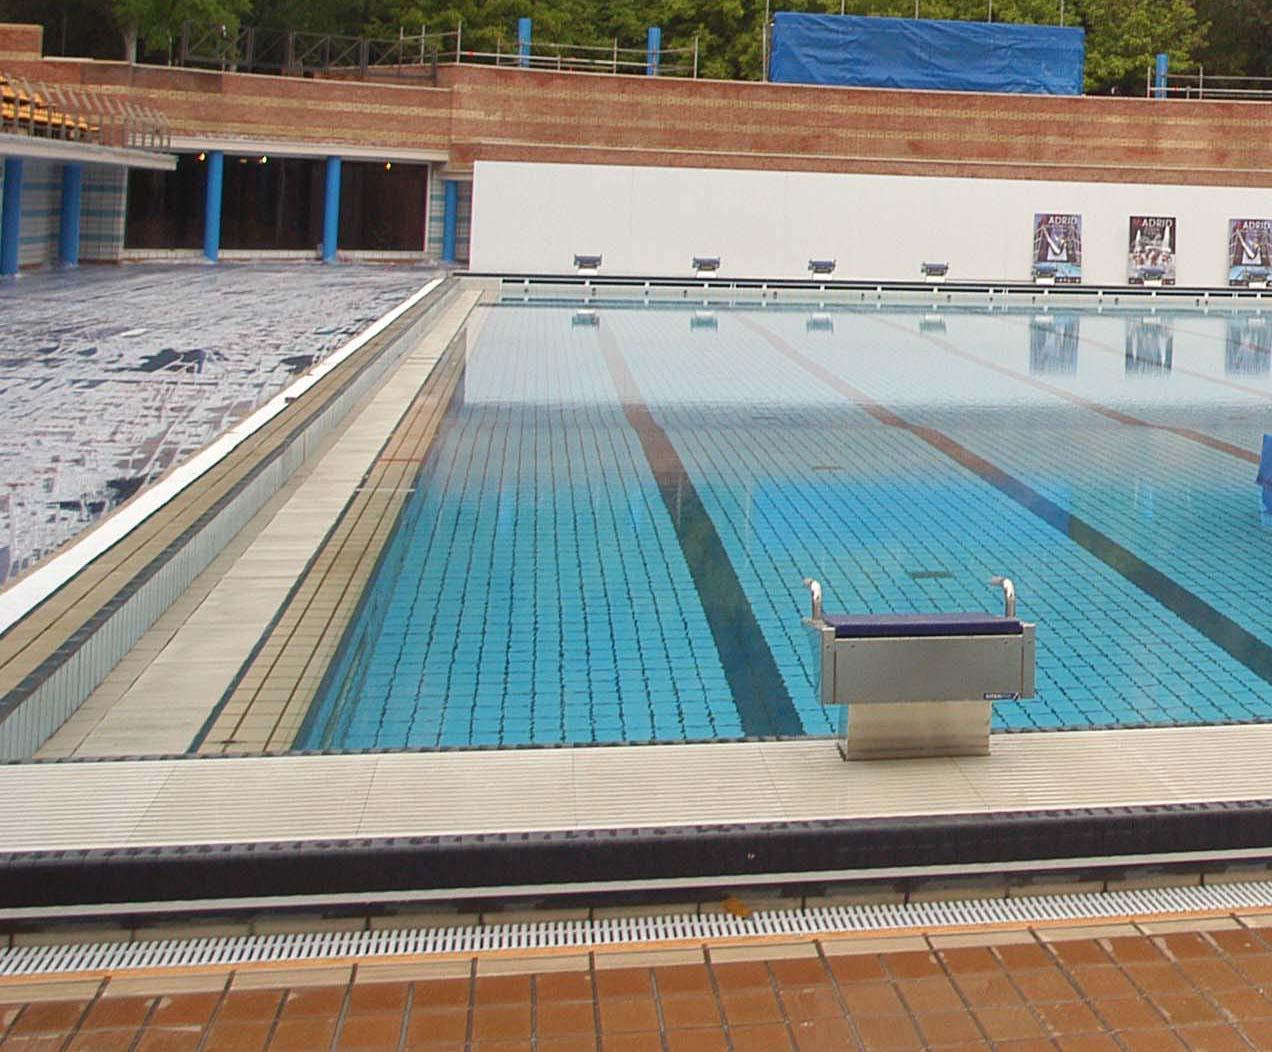 Las piscinas municipales de verano abren ma ana s bado for Piscinas cubiertas municipales madrid